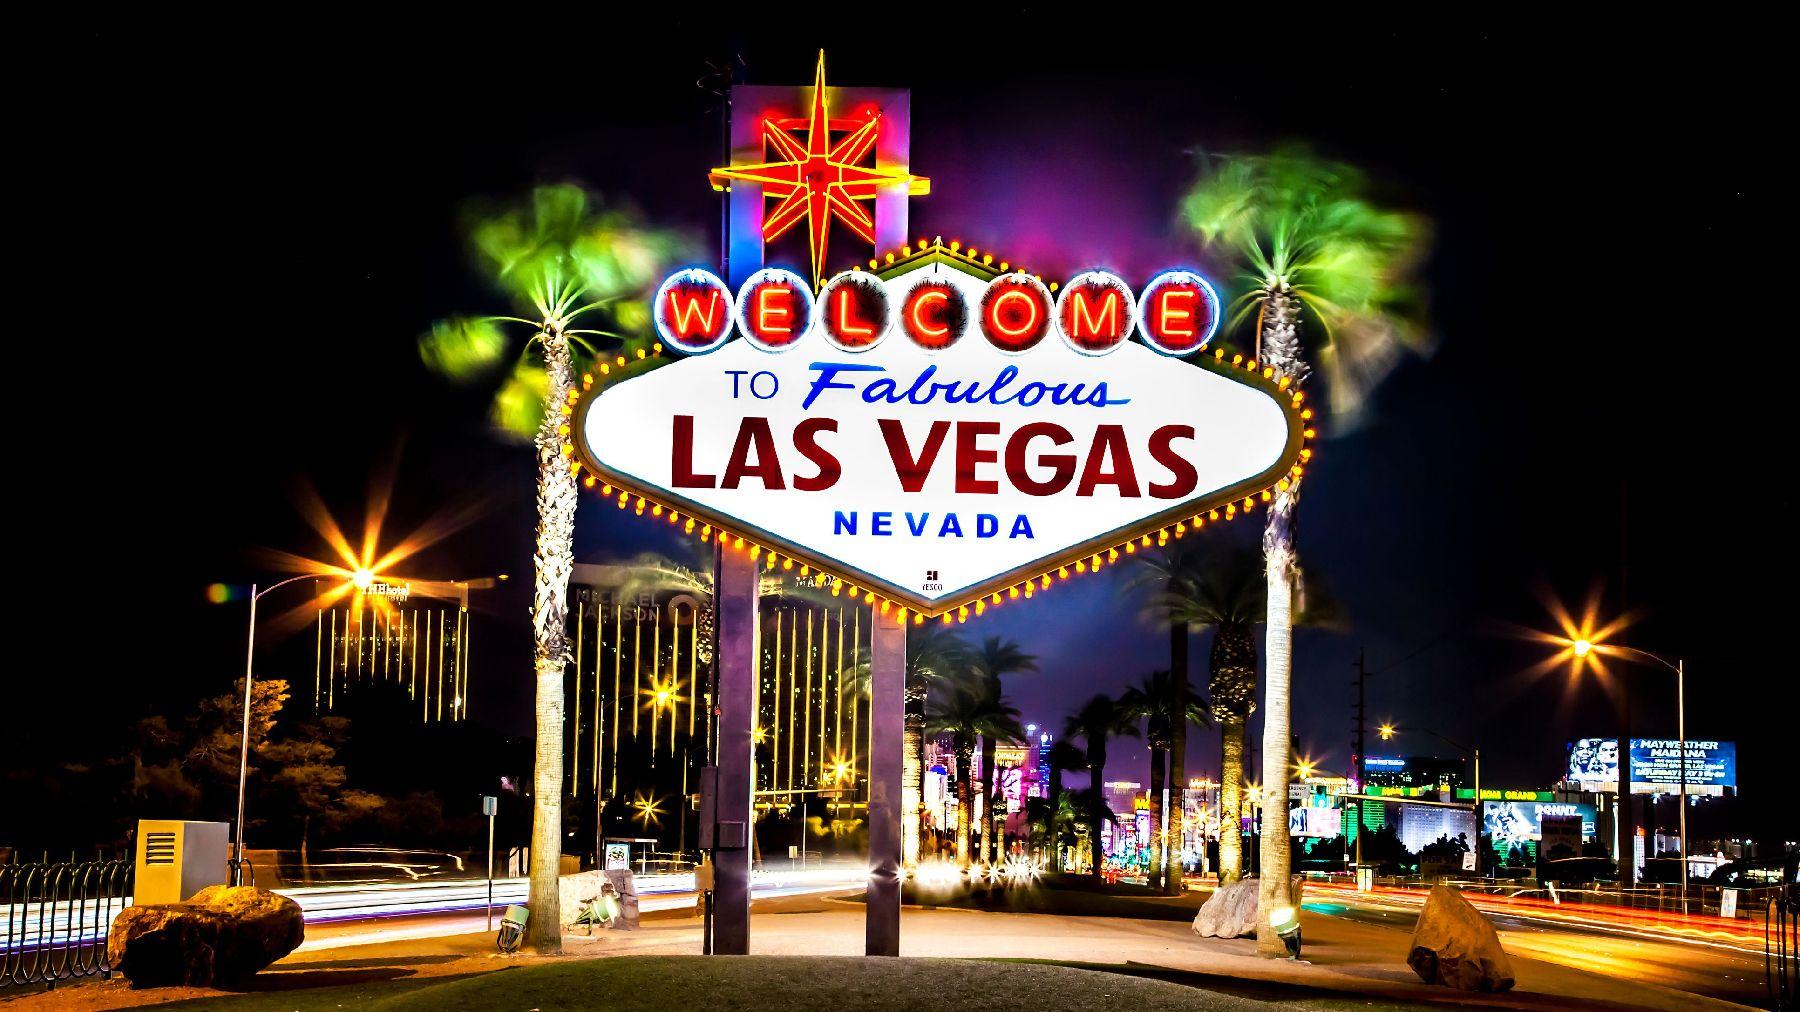 EXPO NAPA 2022 à Las Vegas